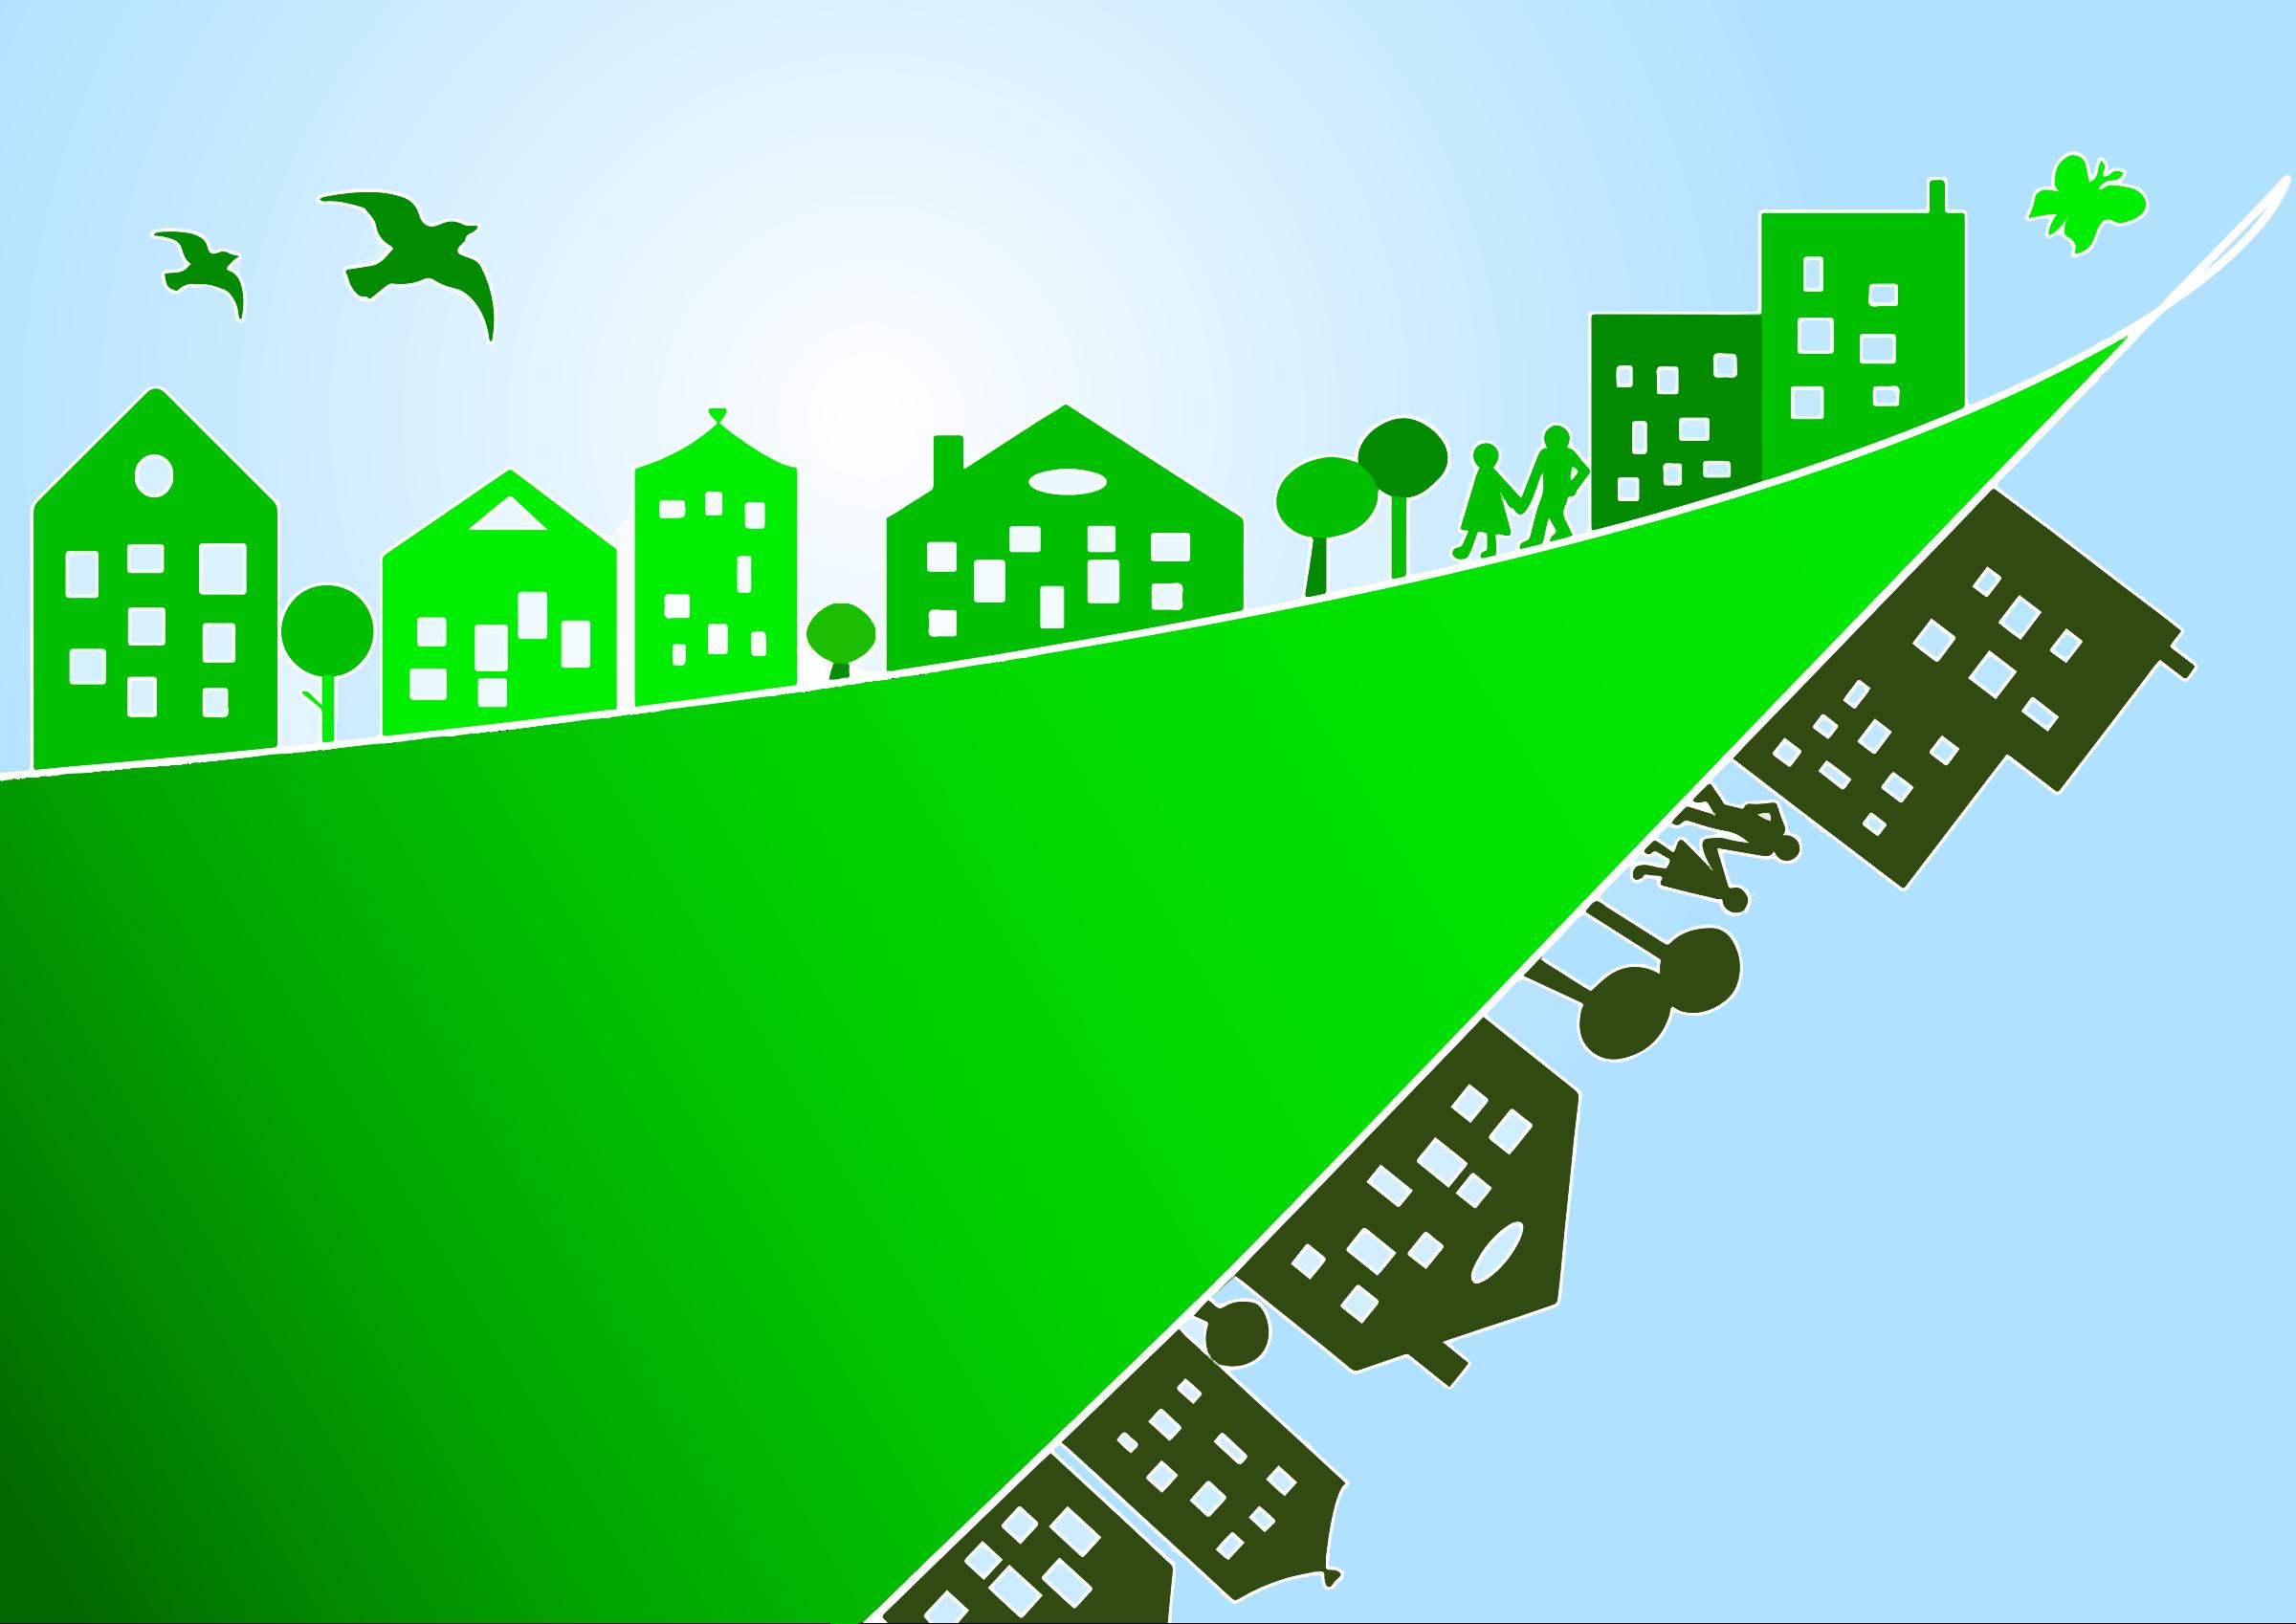 Clipart - Environmental Awareness clip free download